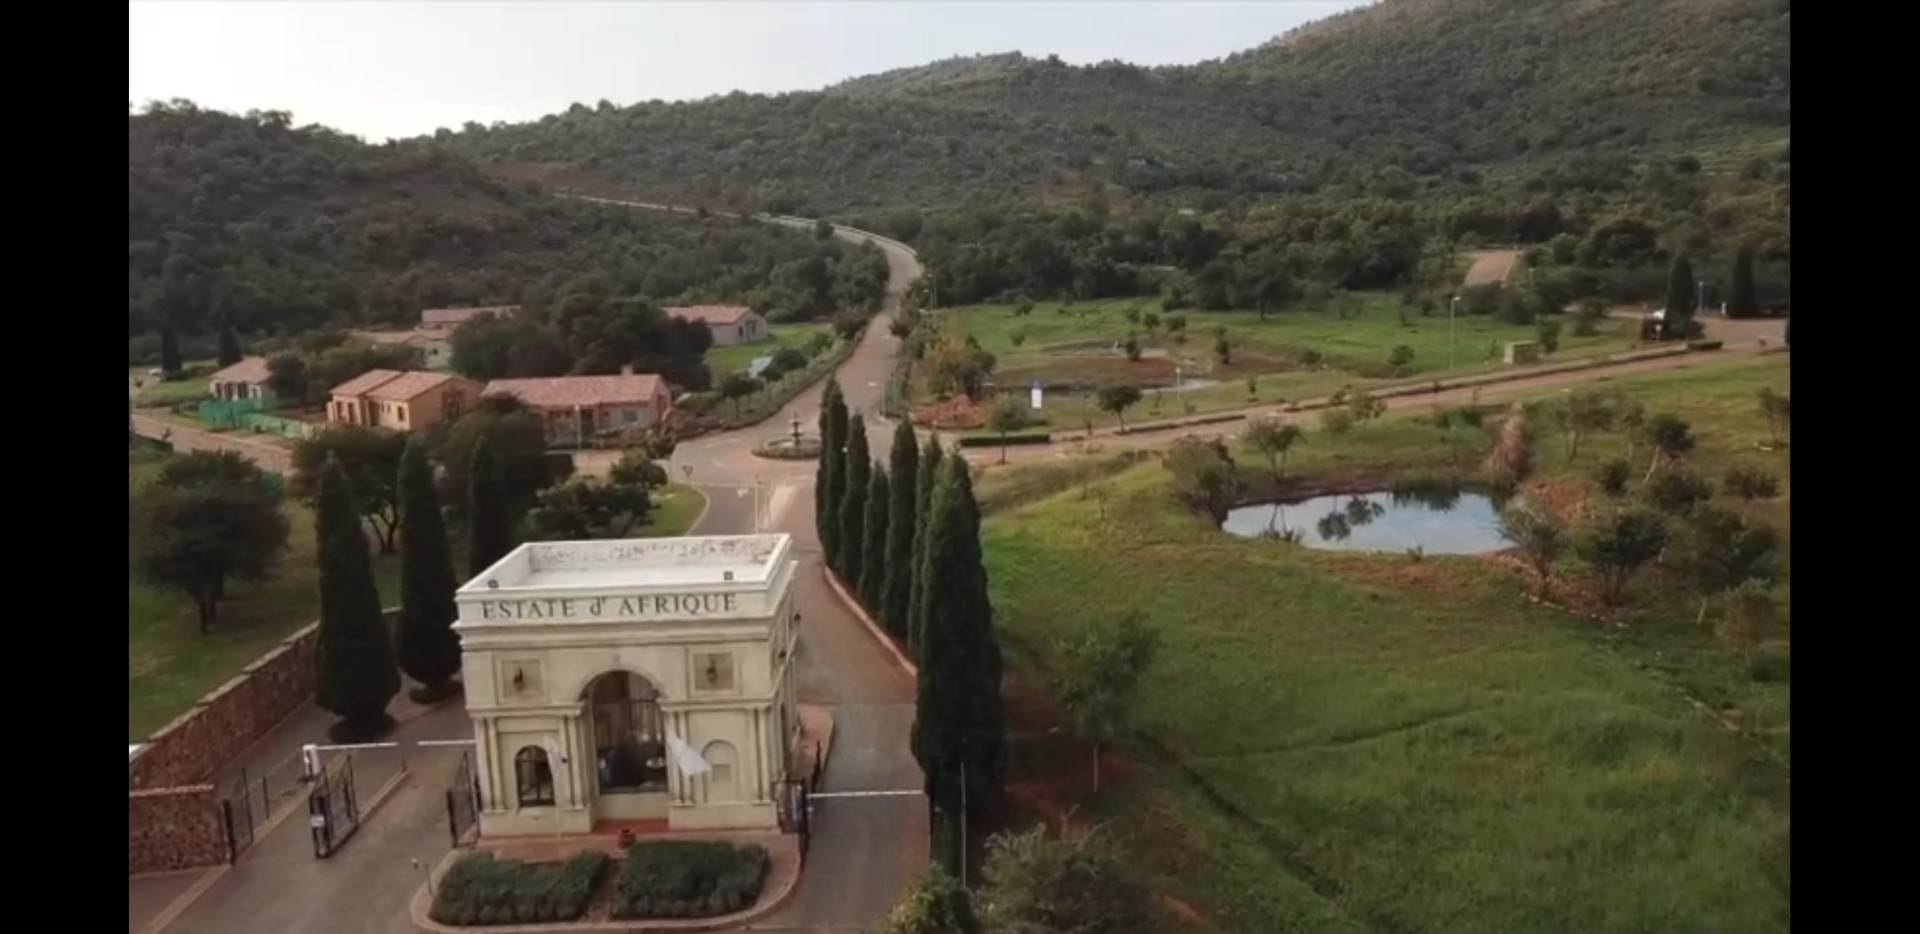 3 BedroomHouse For Sale In Estate D Afrique